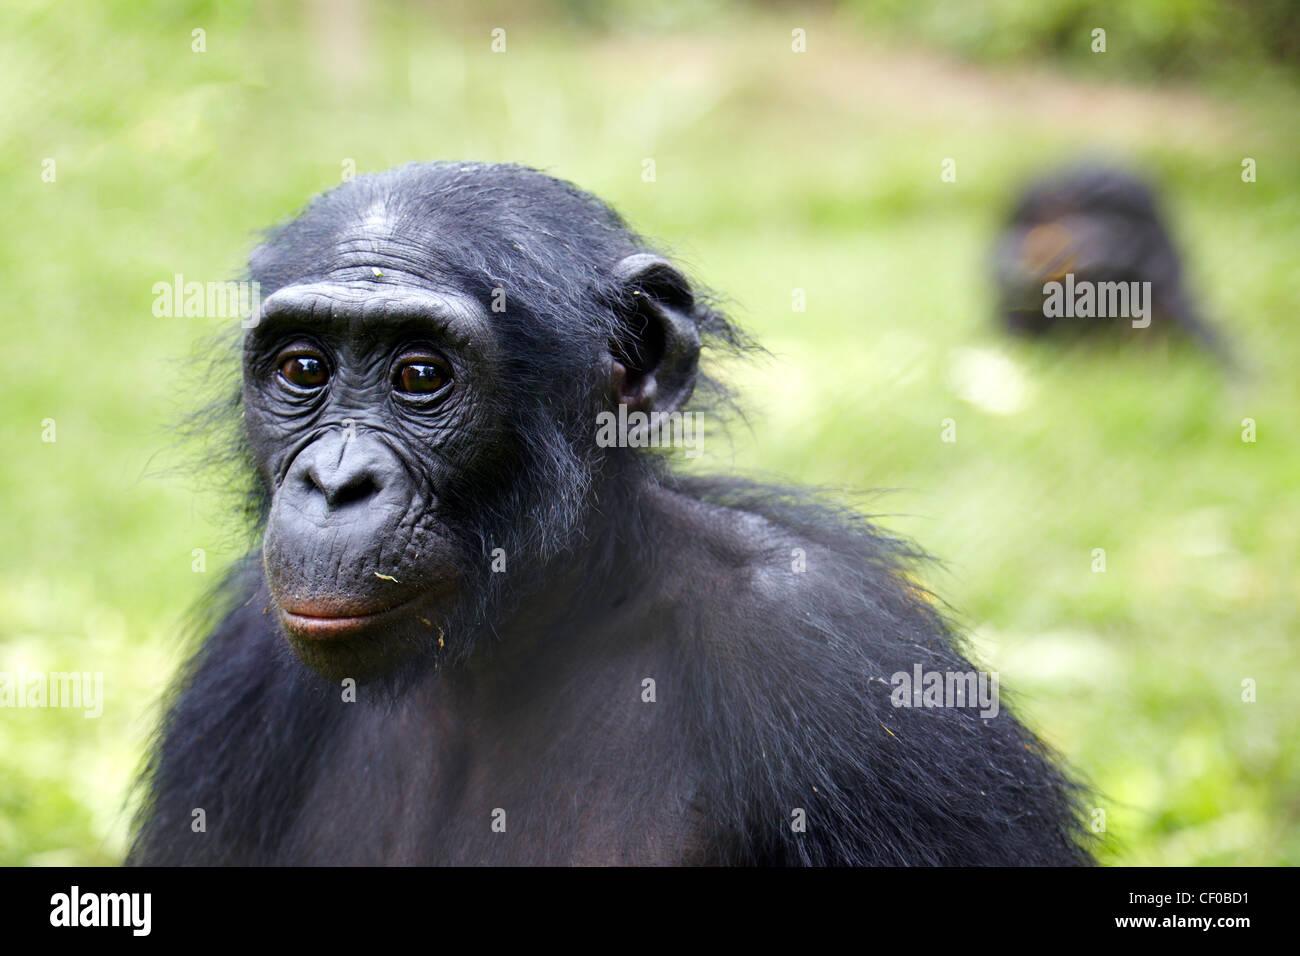 Bonobo (Pan paniscus), Democratic Republic of Congo, Africa - Stock Image